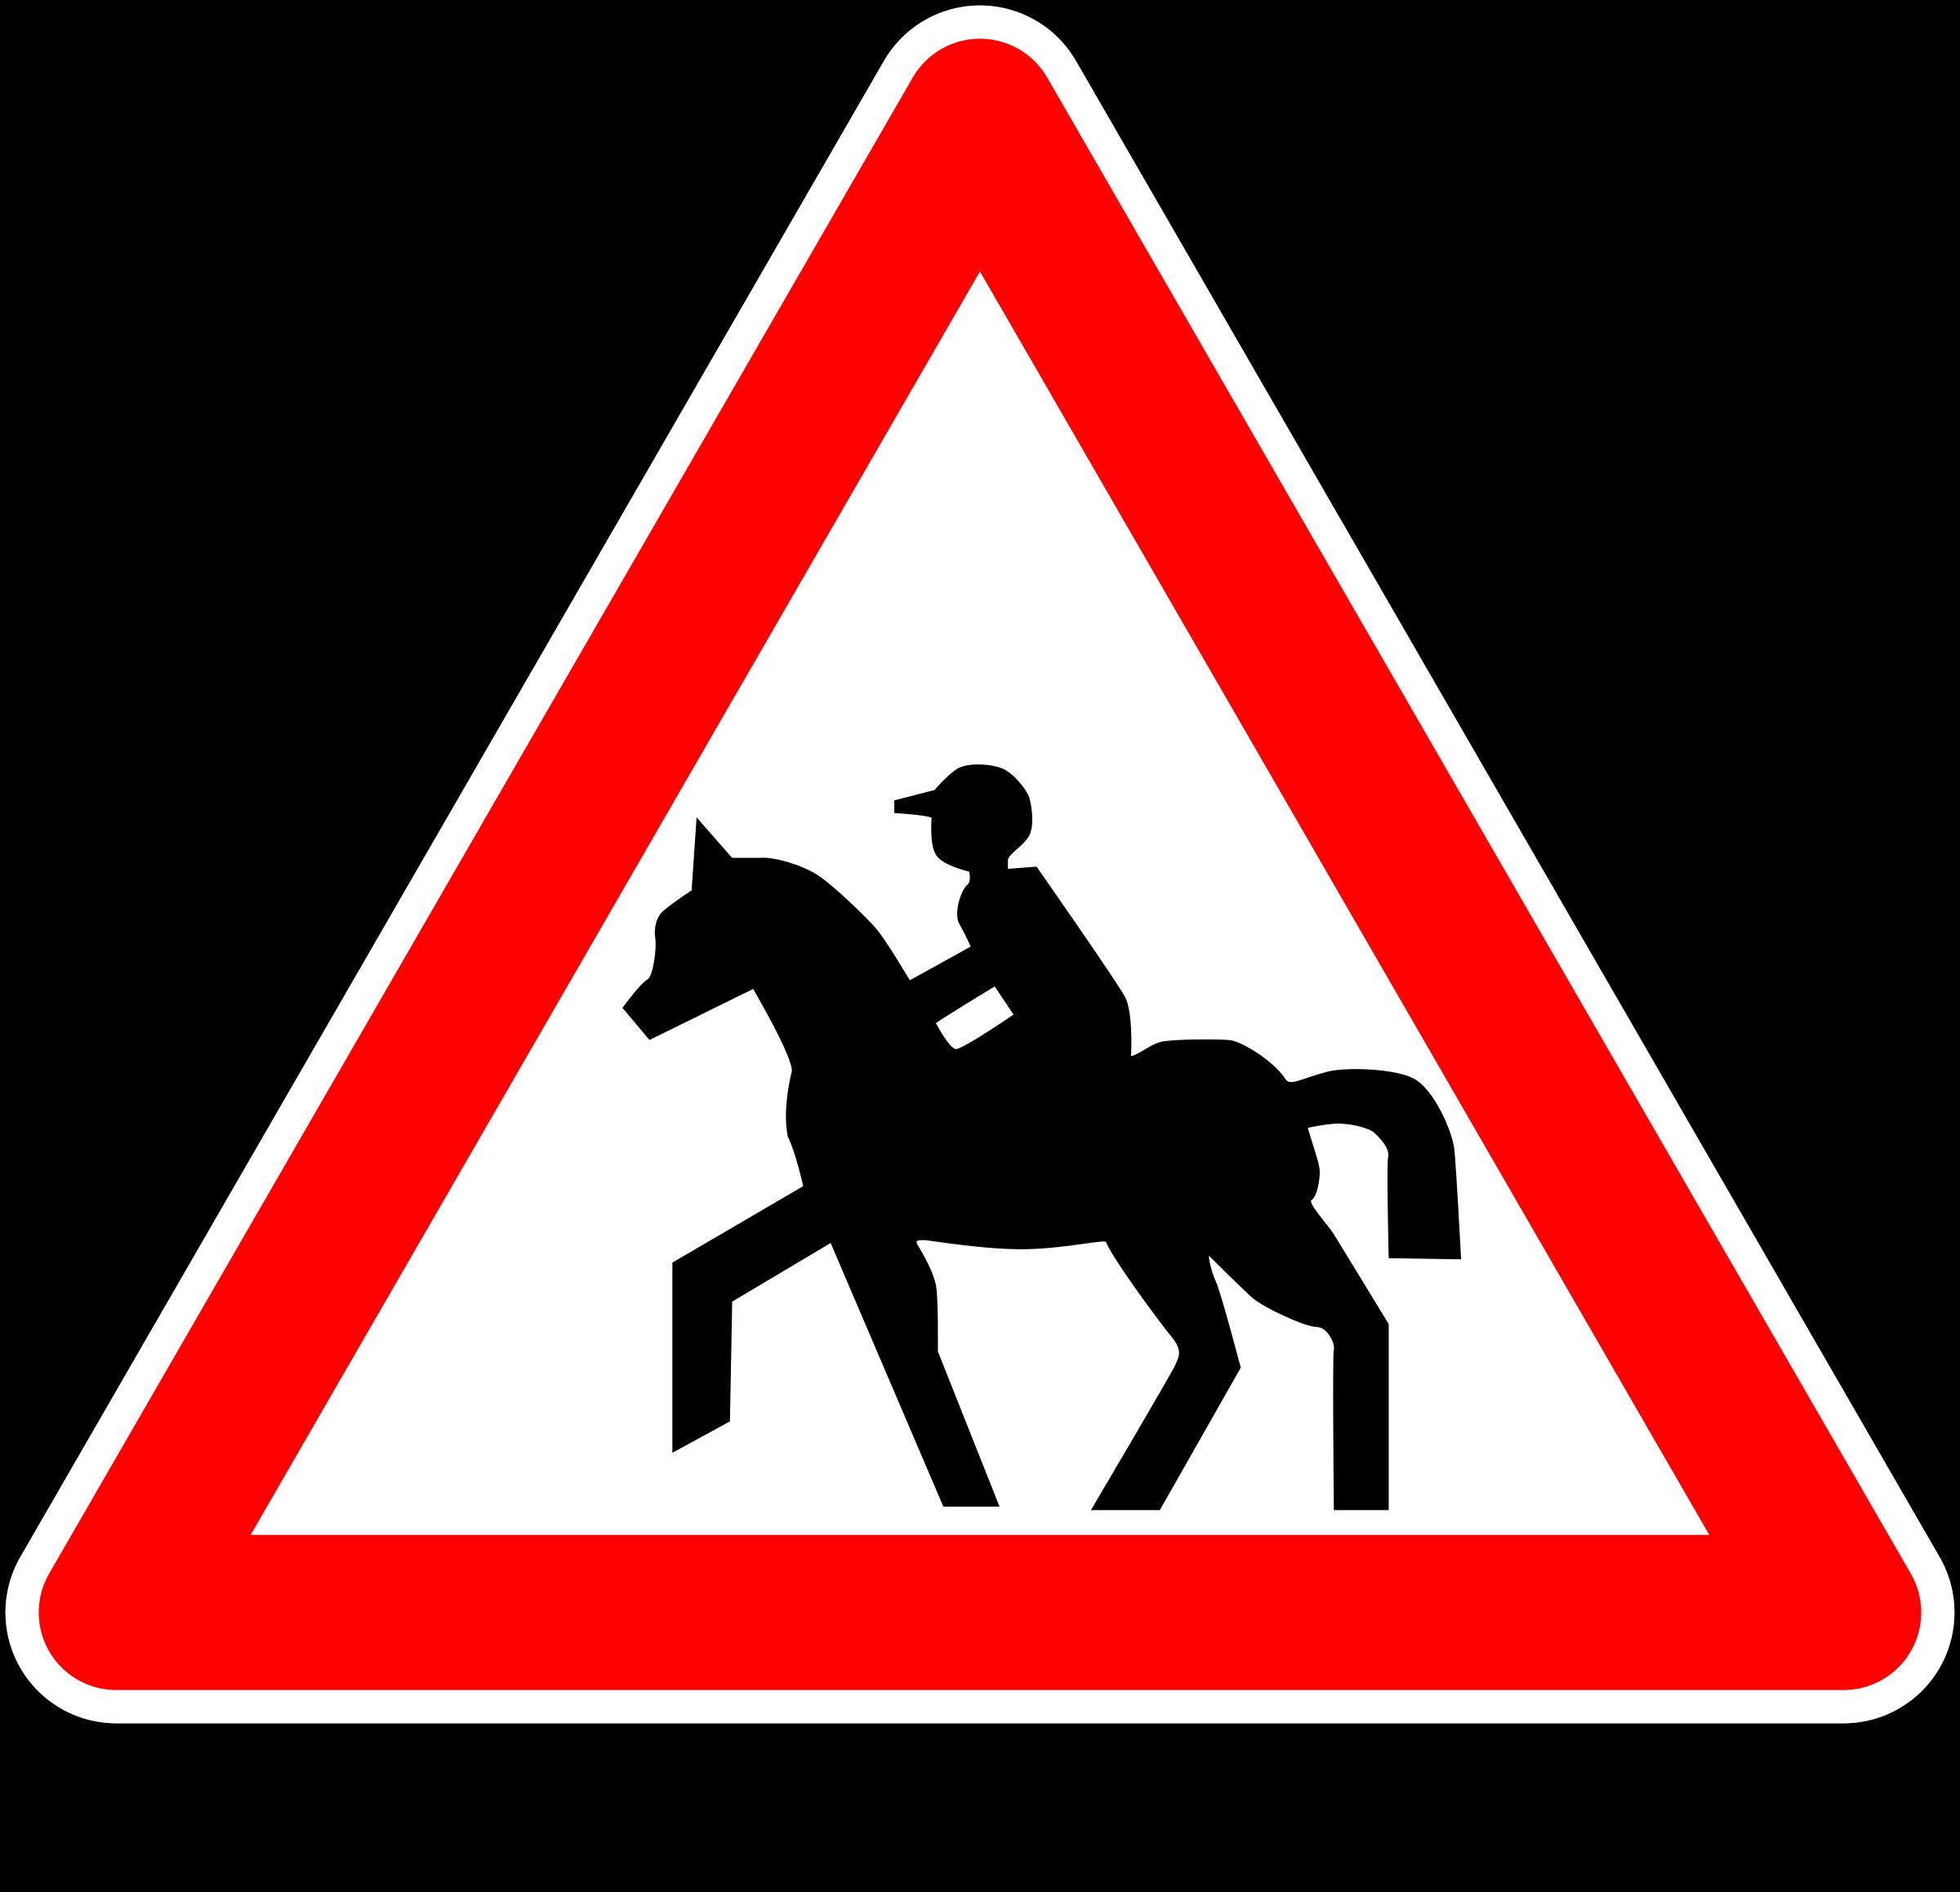 Horse clipart sign. Warning riding big image